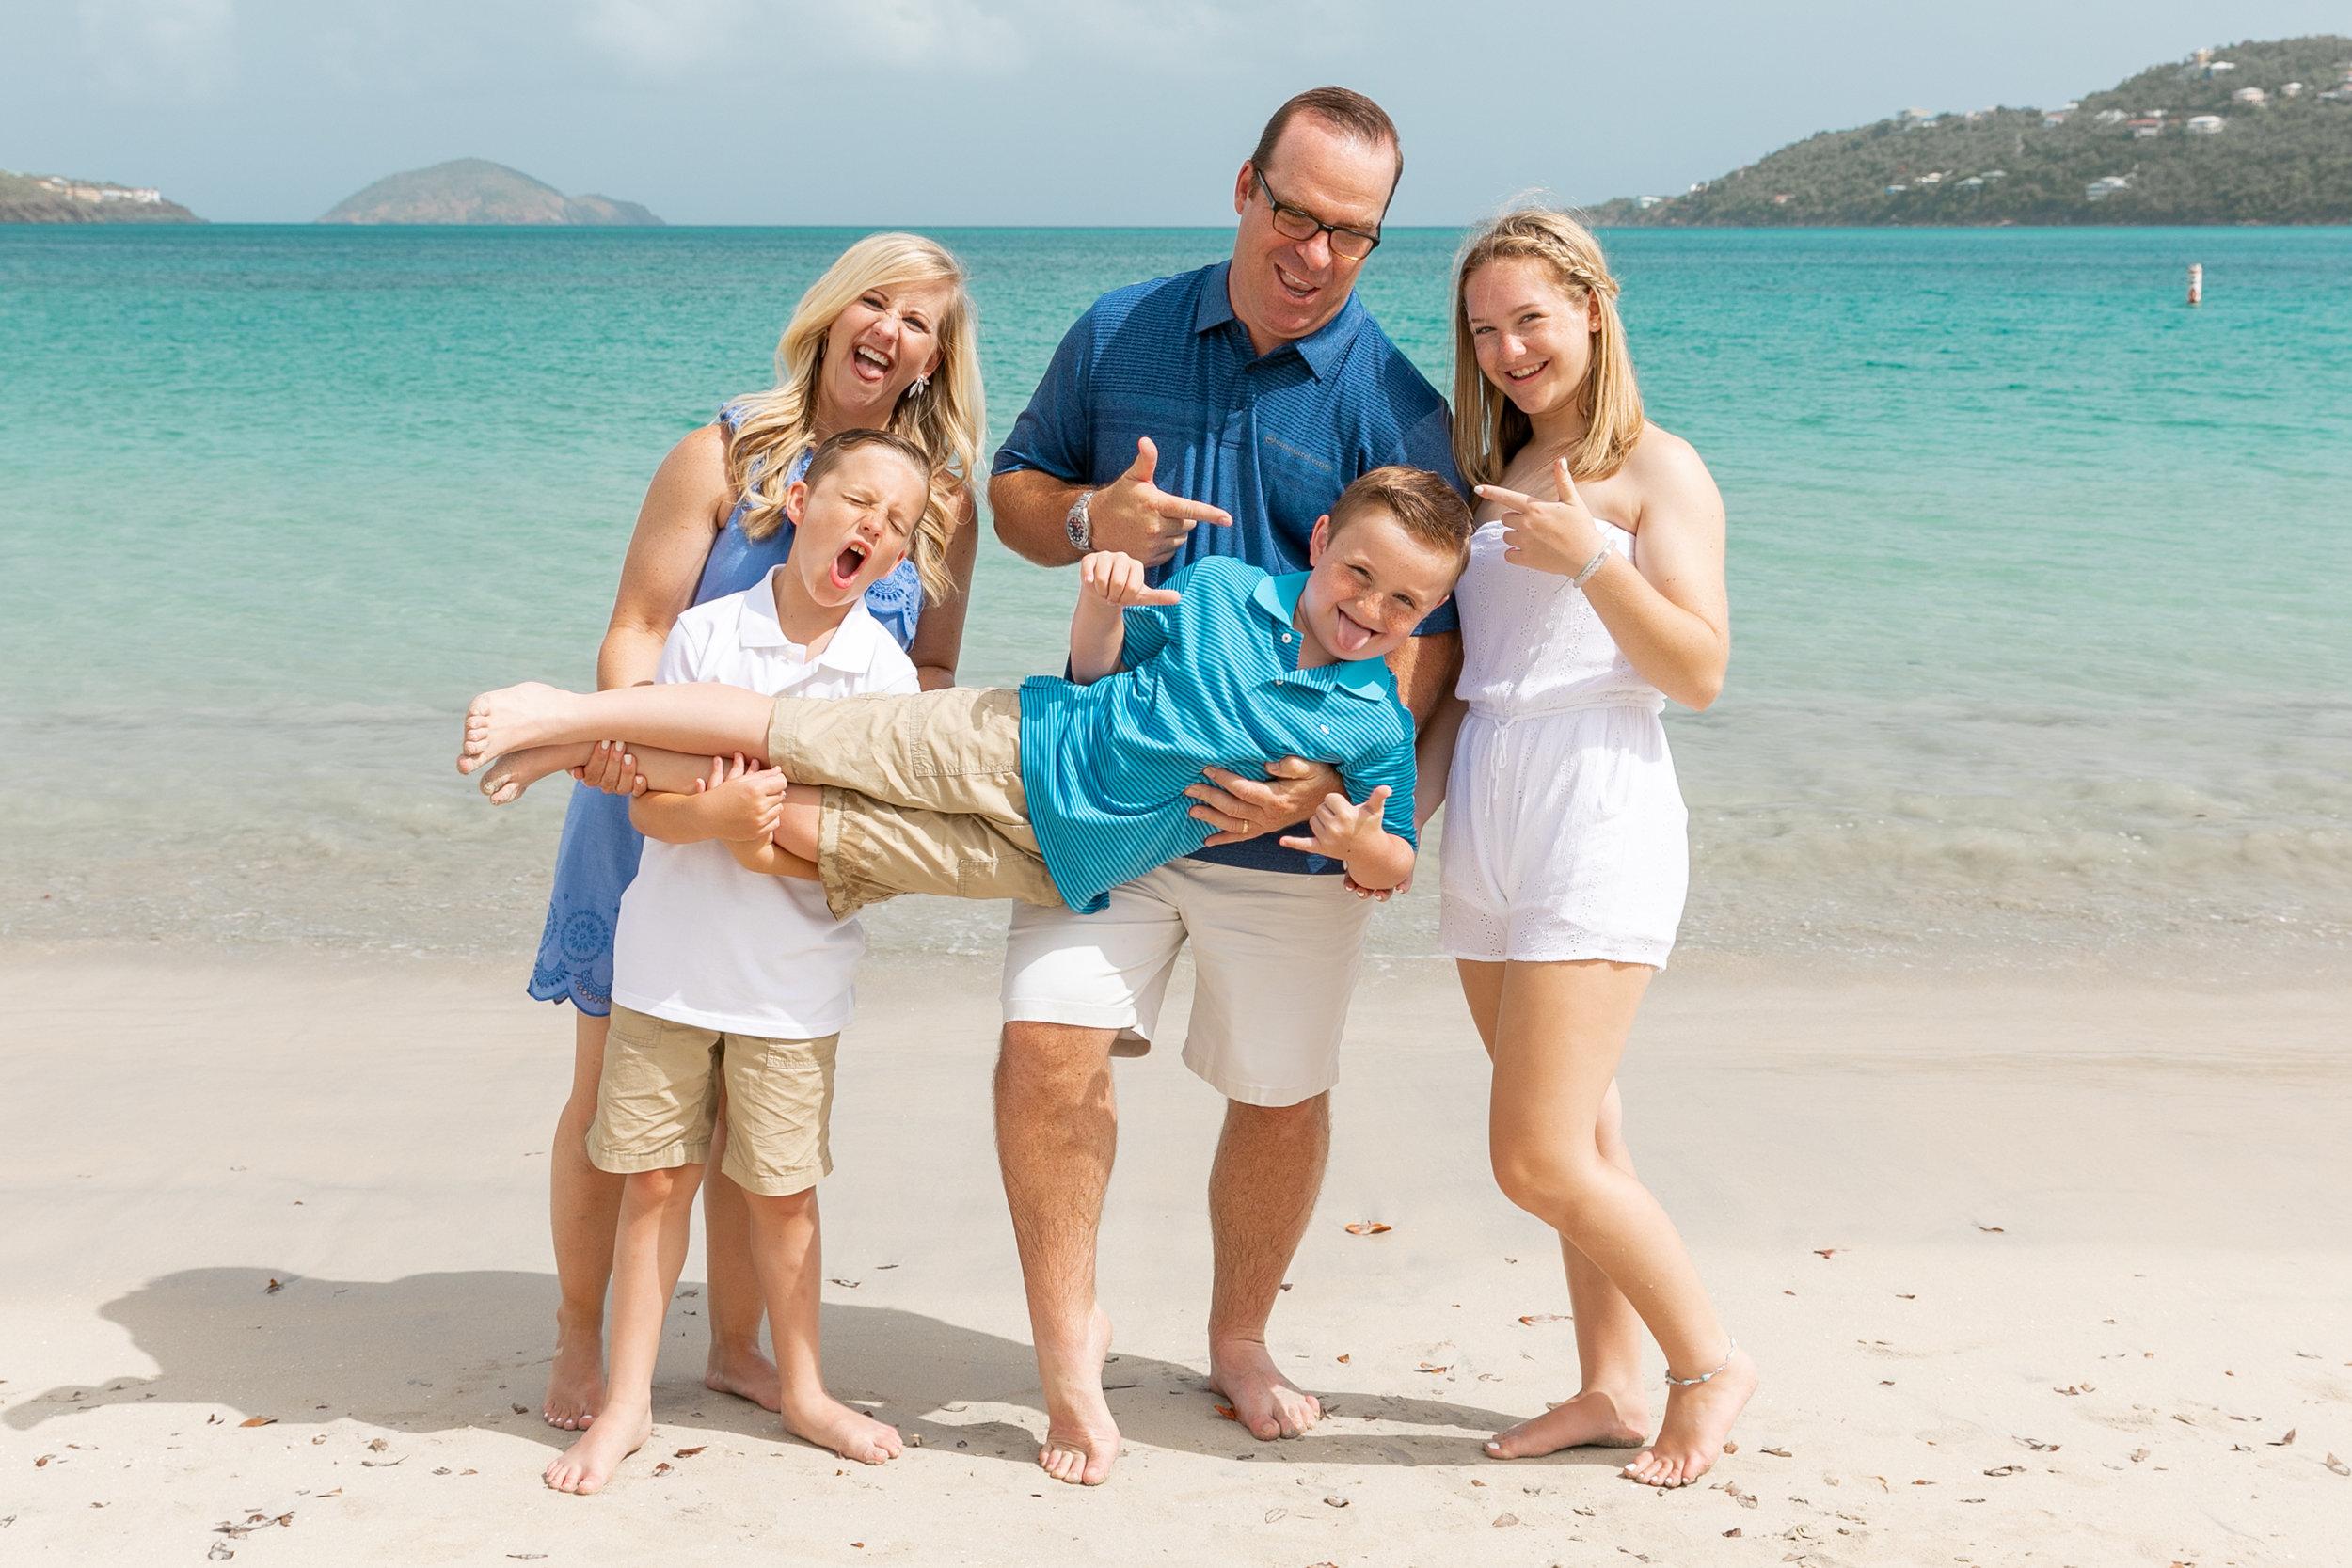 st thomas family photo session.jpg